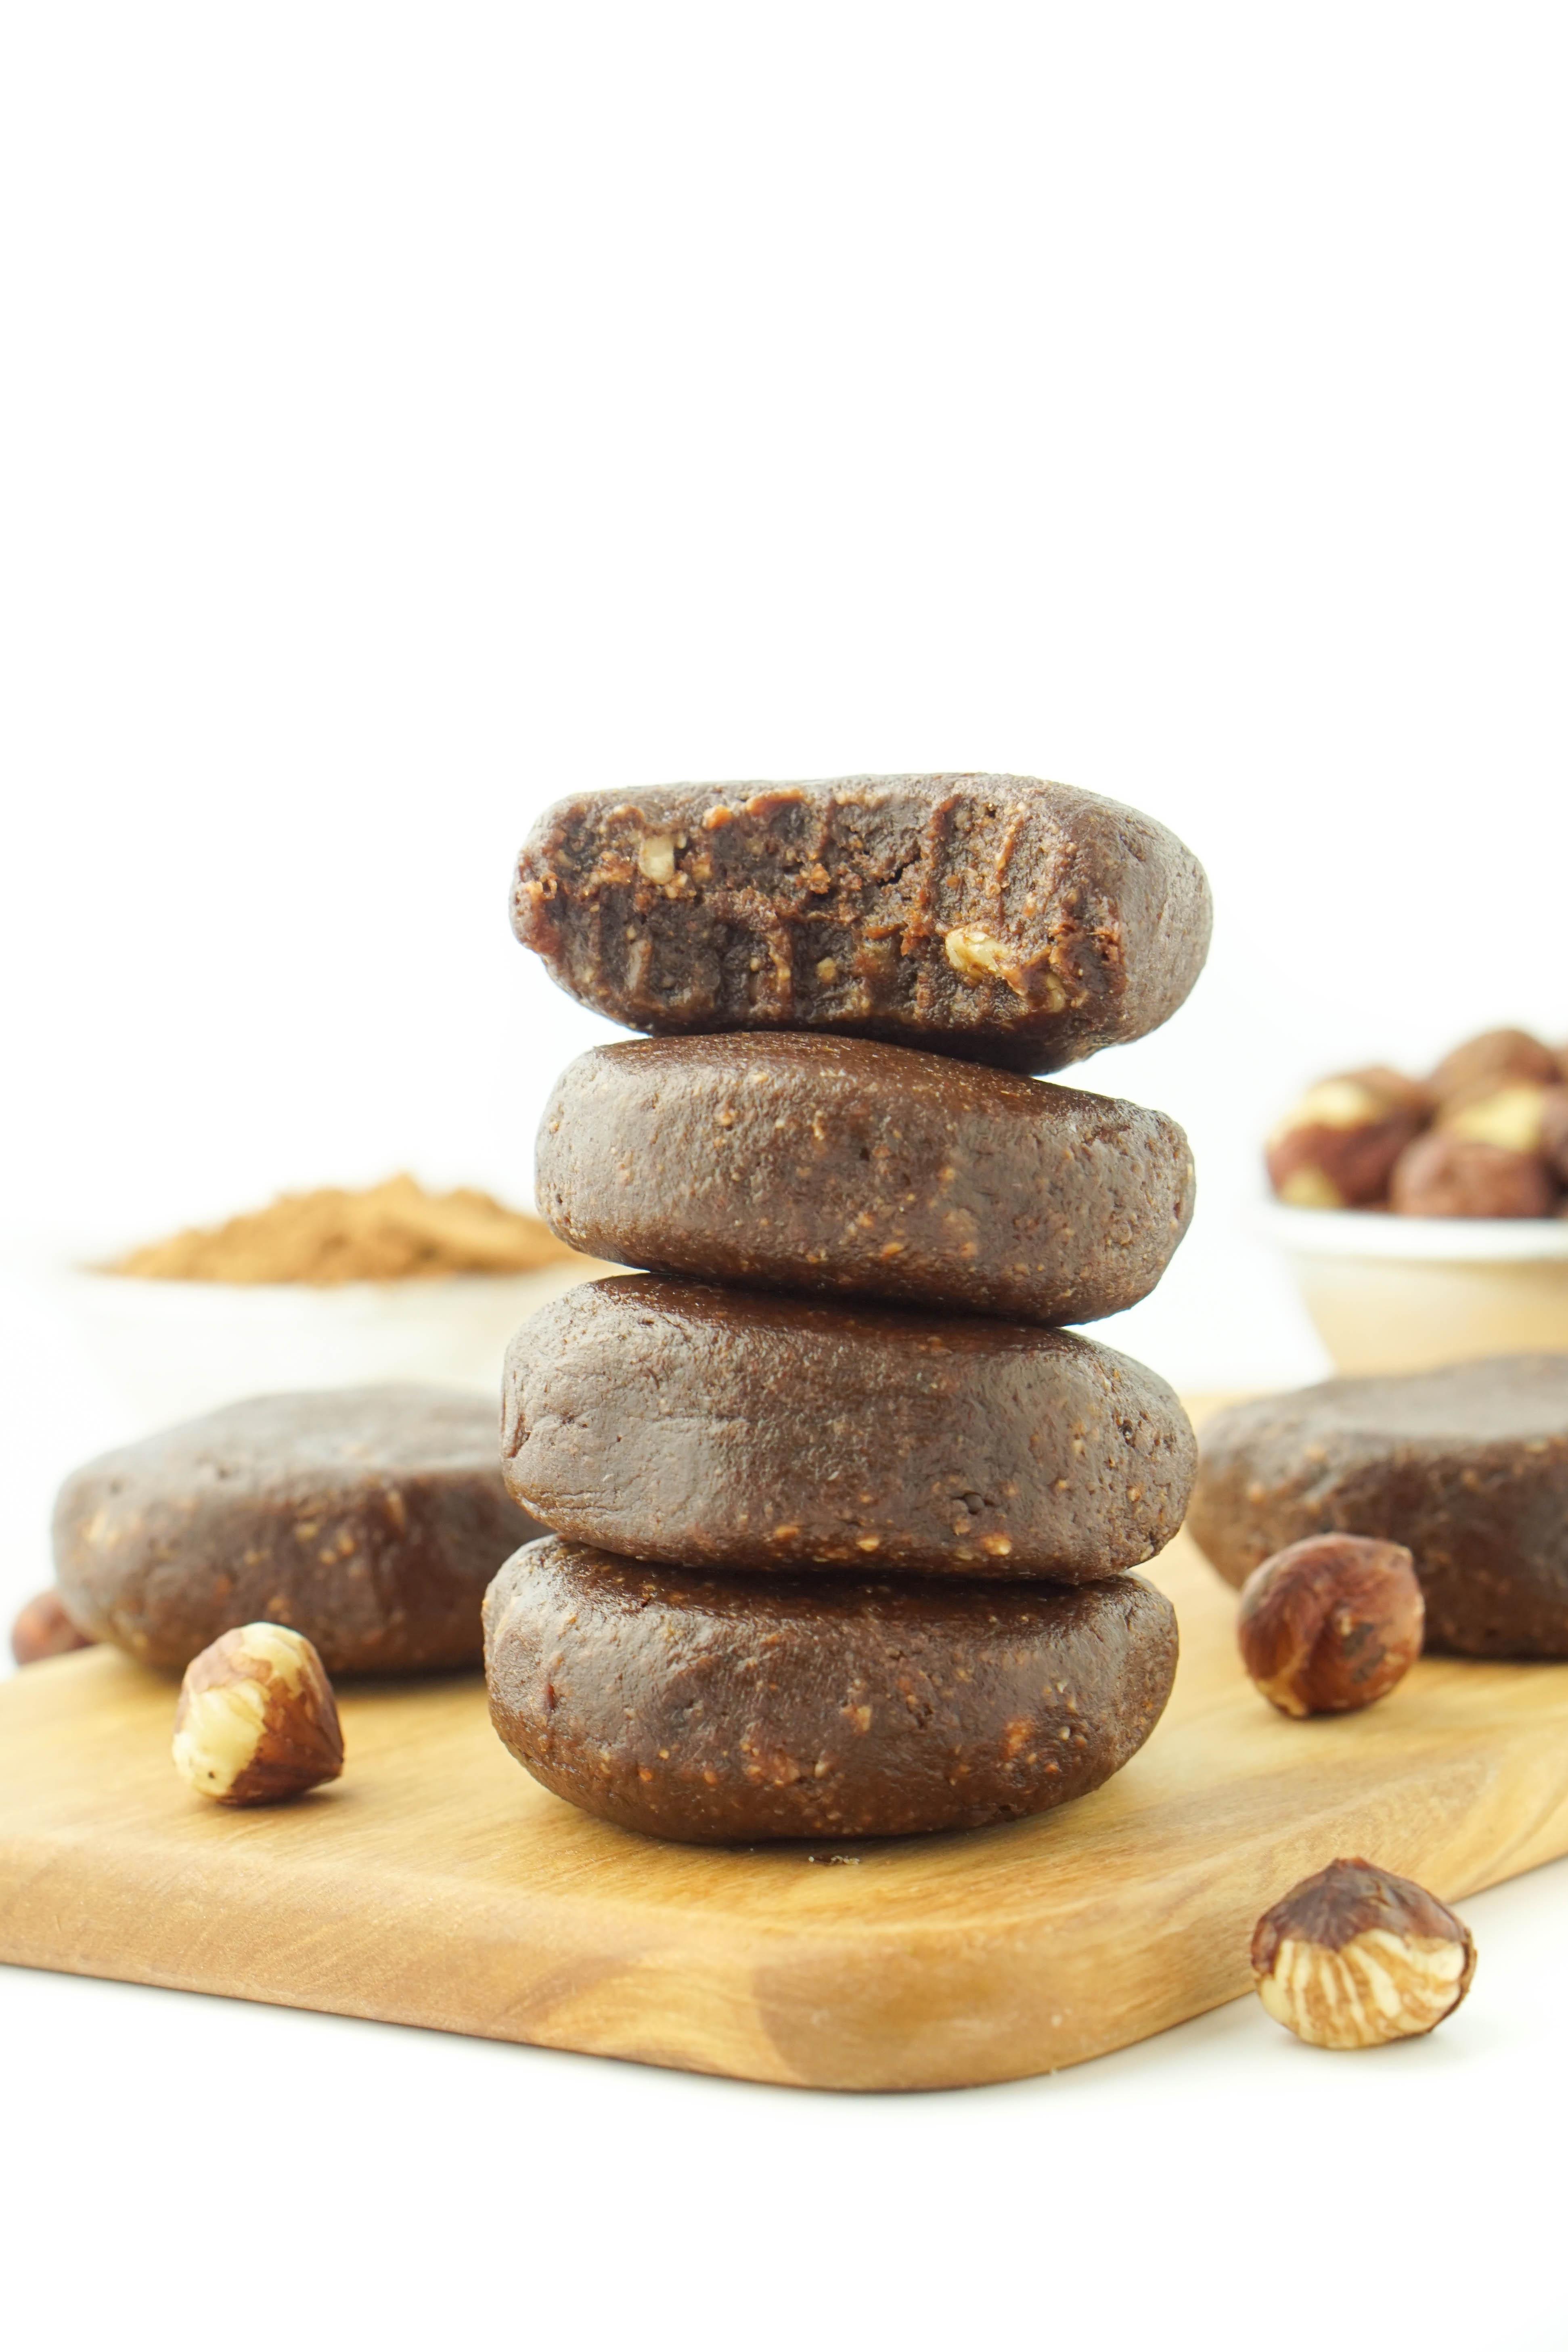 Hazelnut cookie recipe with nutella